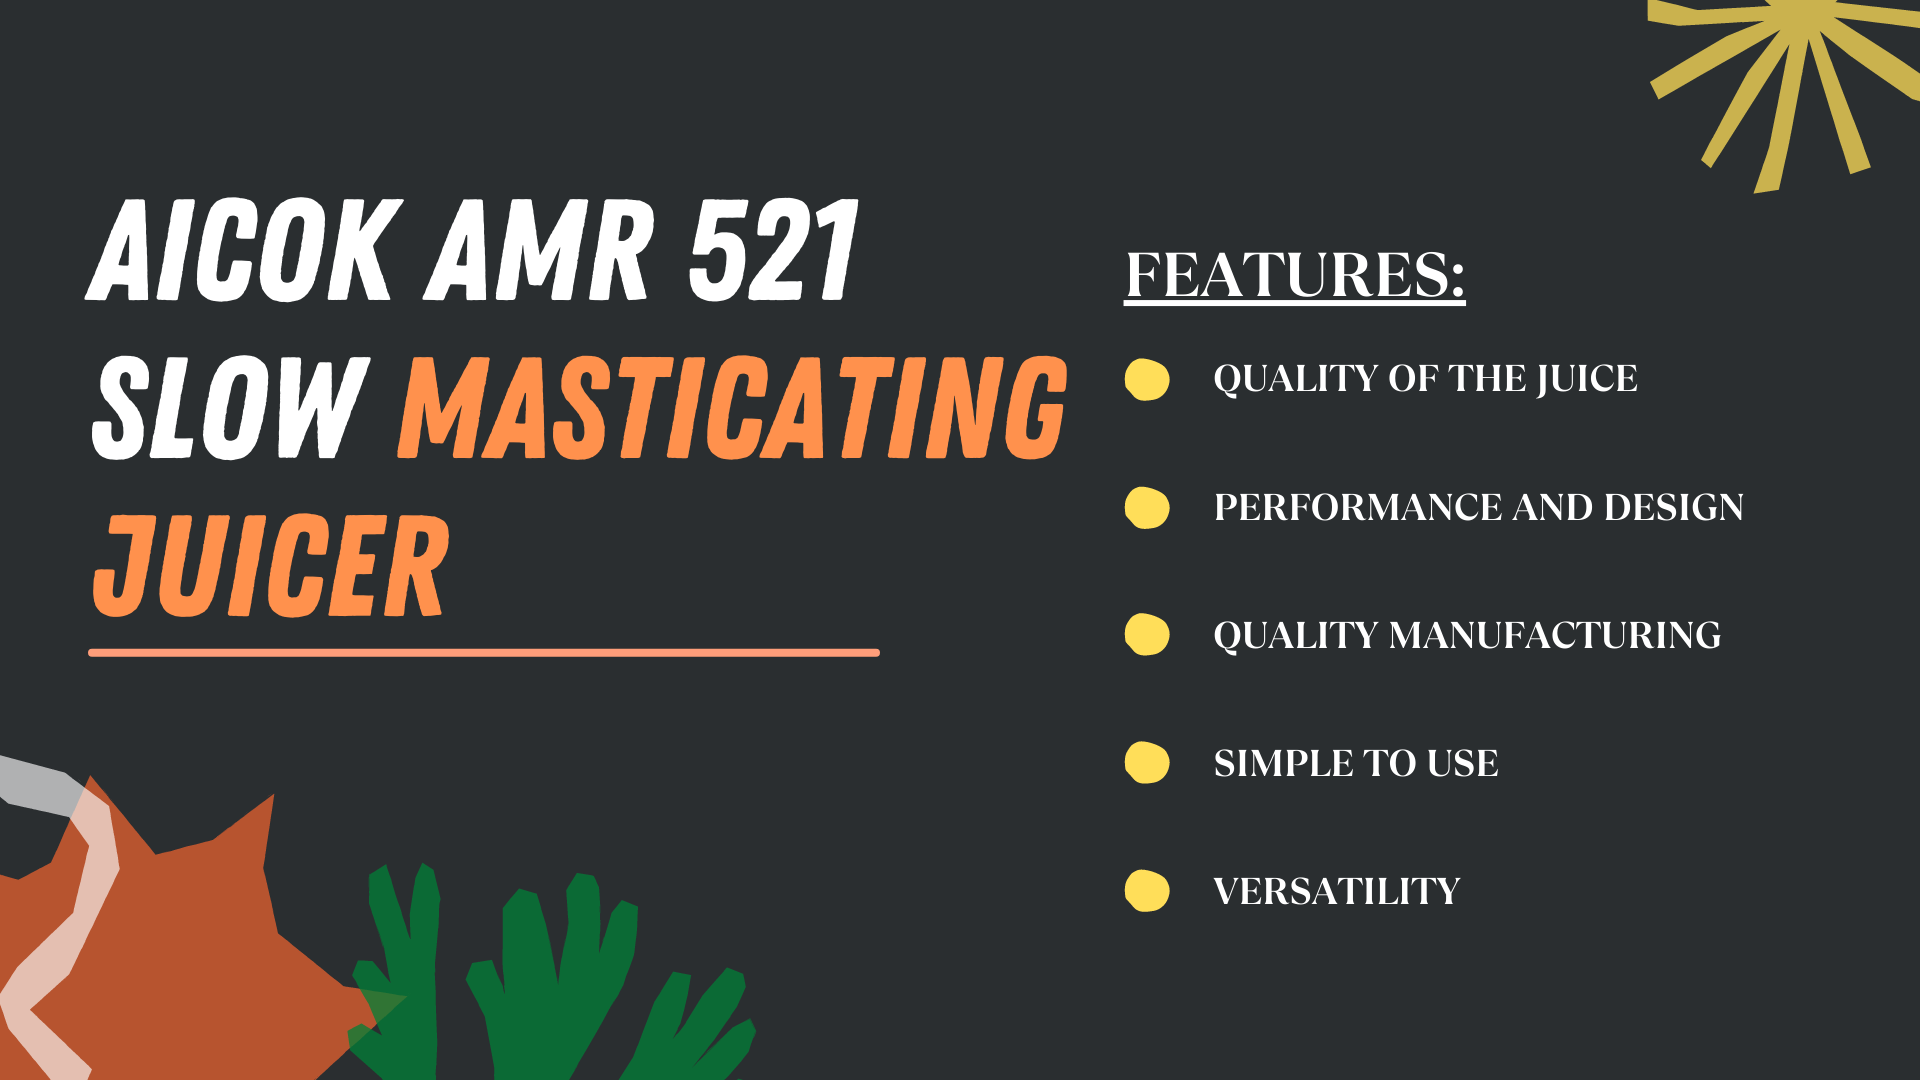 Aicok AMR 521 Slow Masticating Juicer